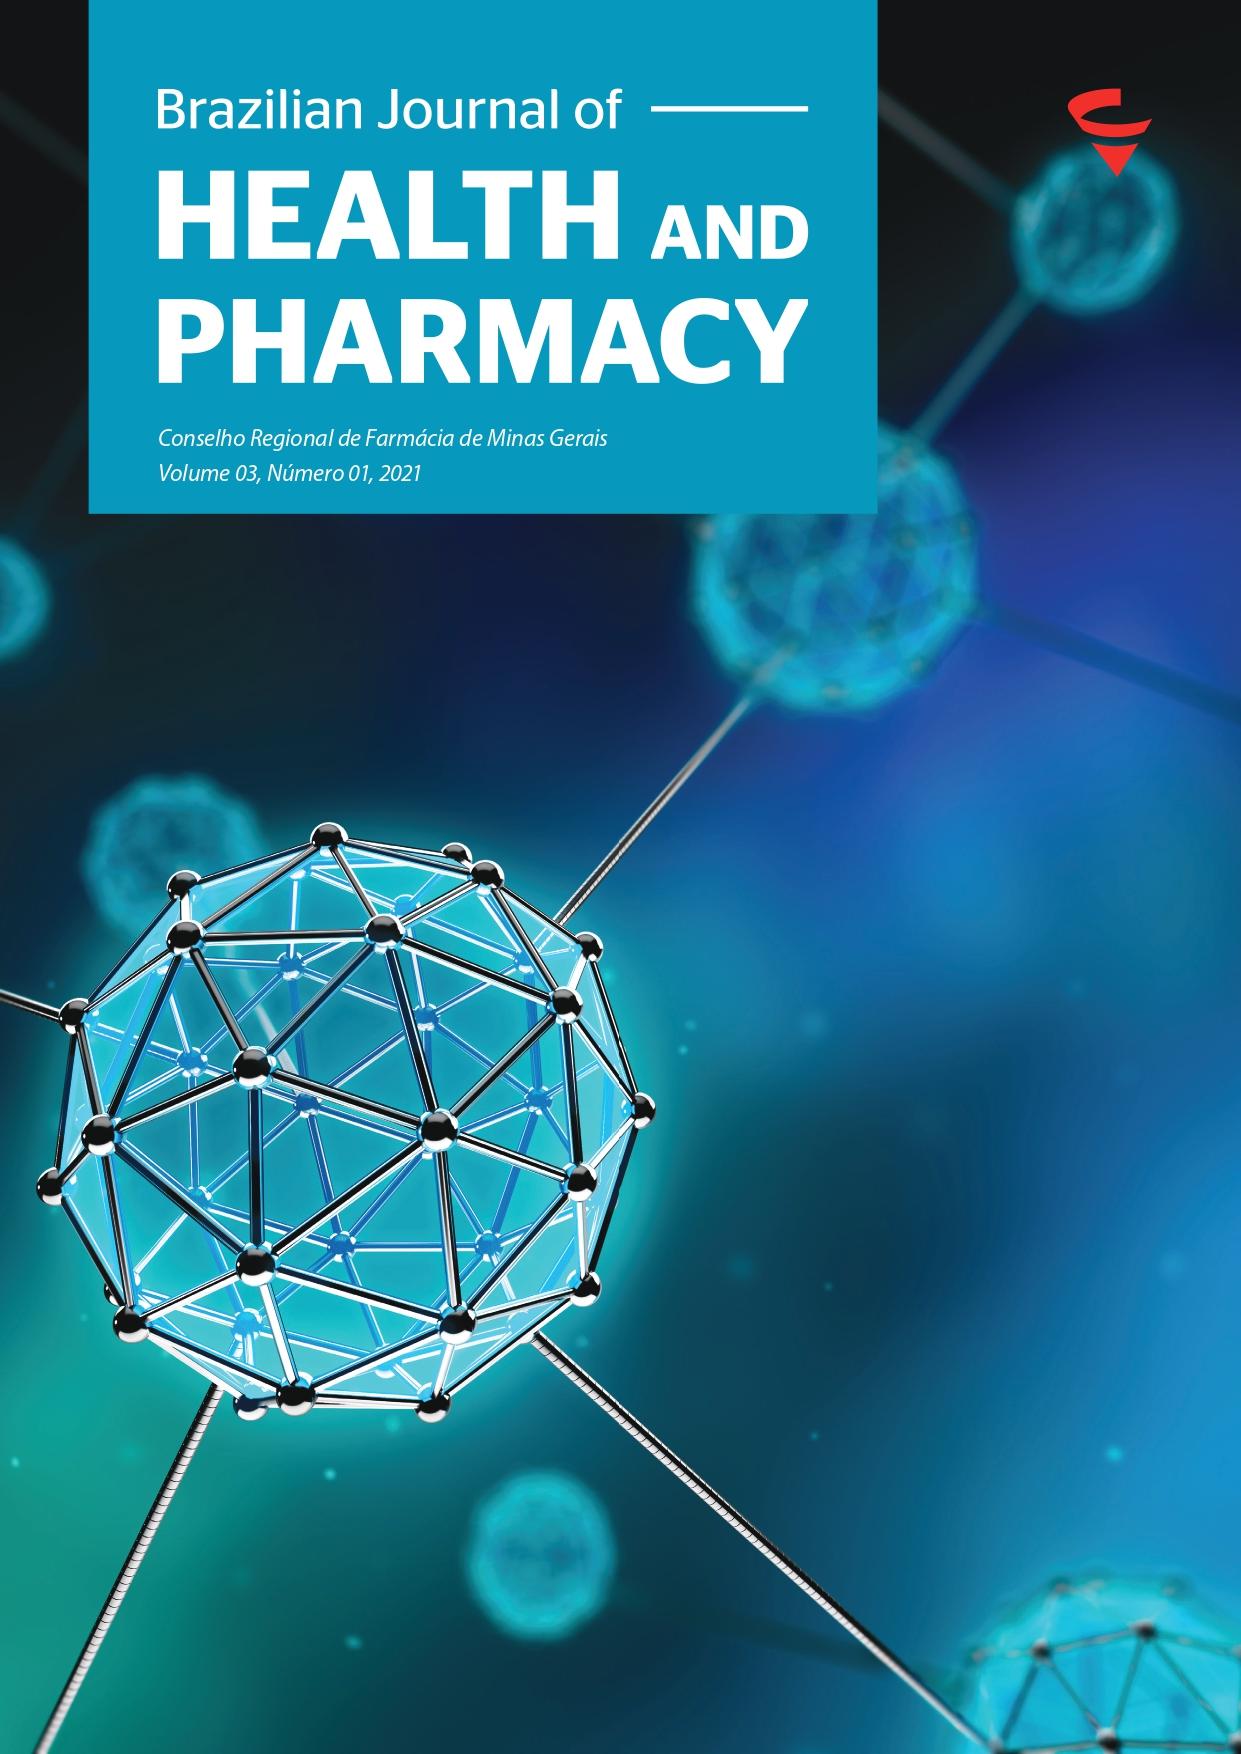 Capa Revista Cientifica BJHP V3 N1 2021